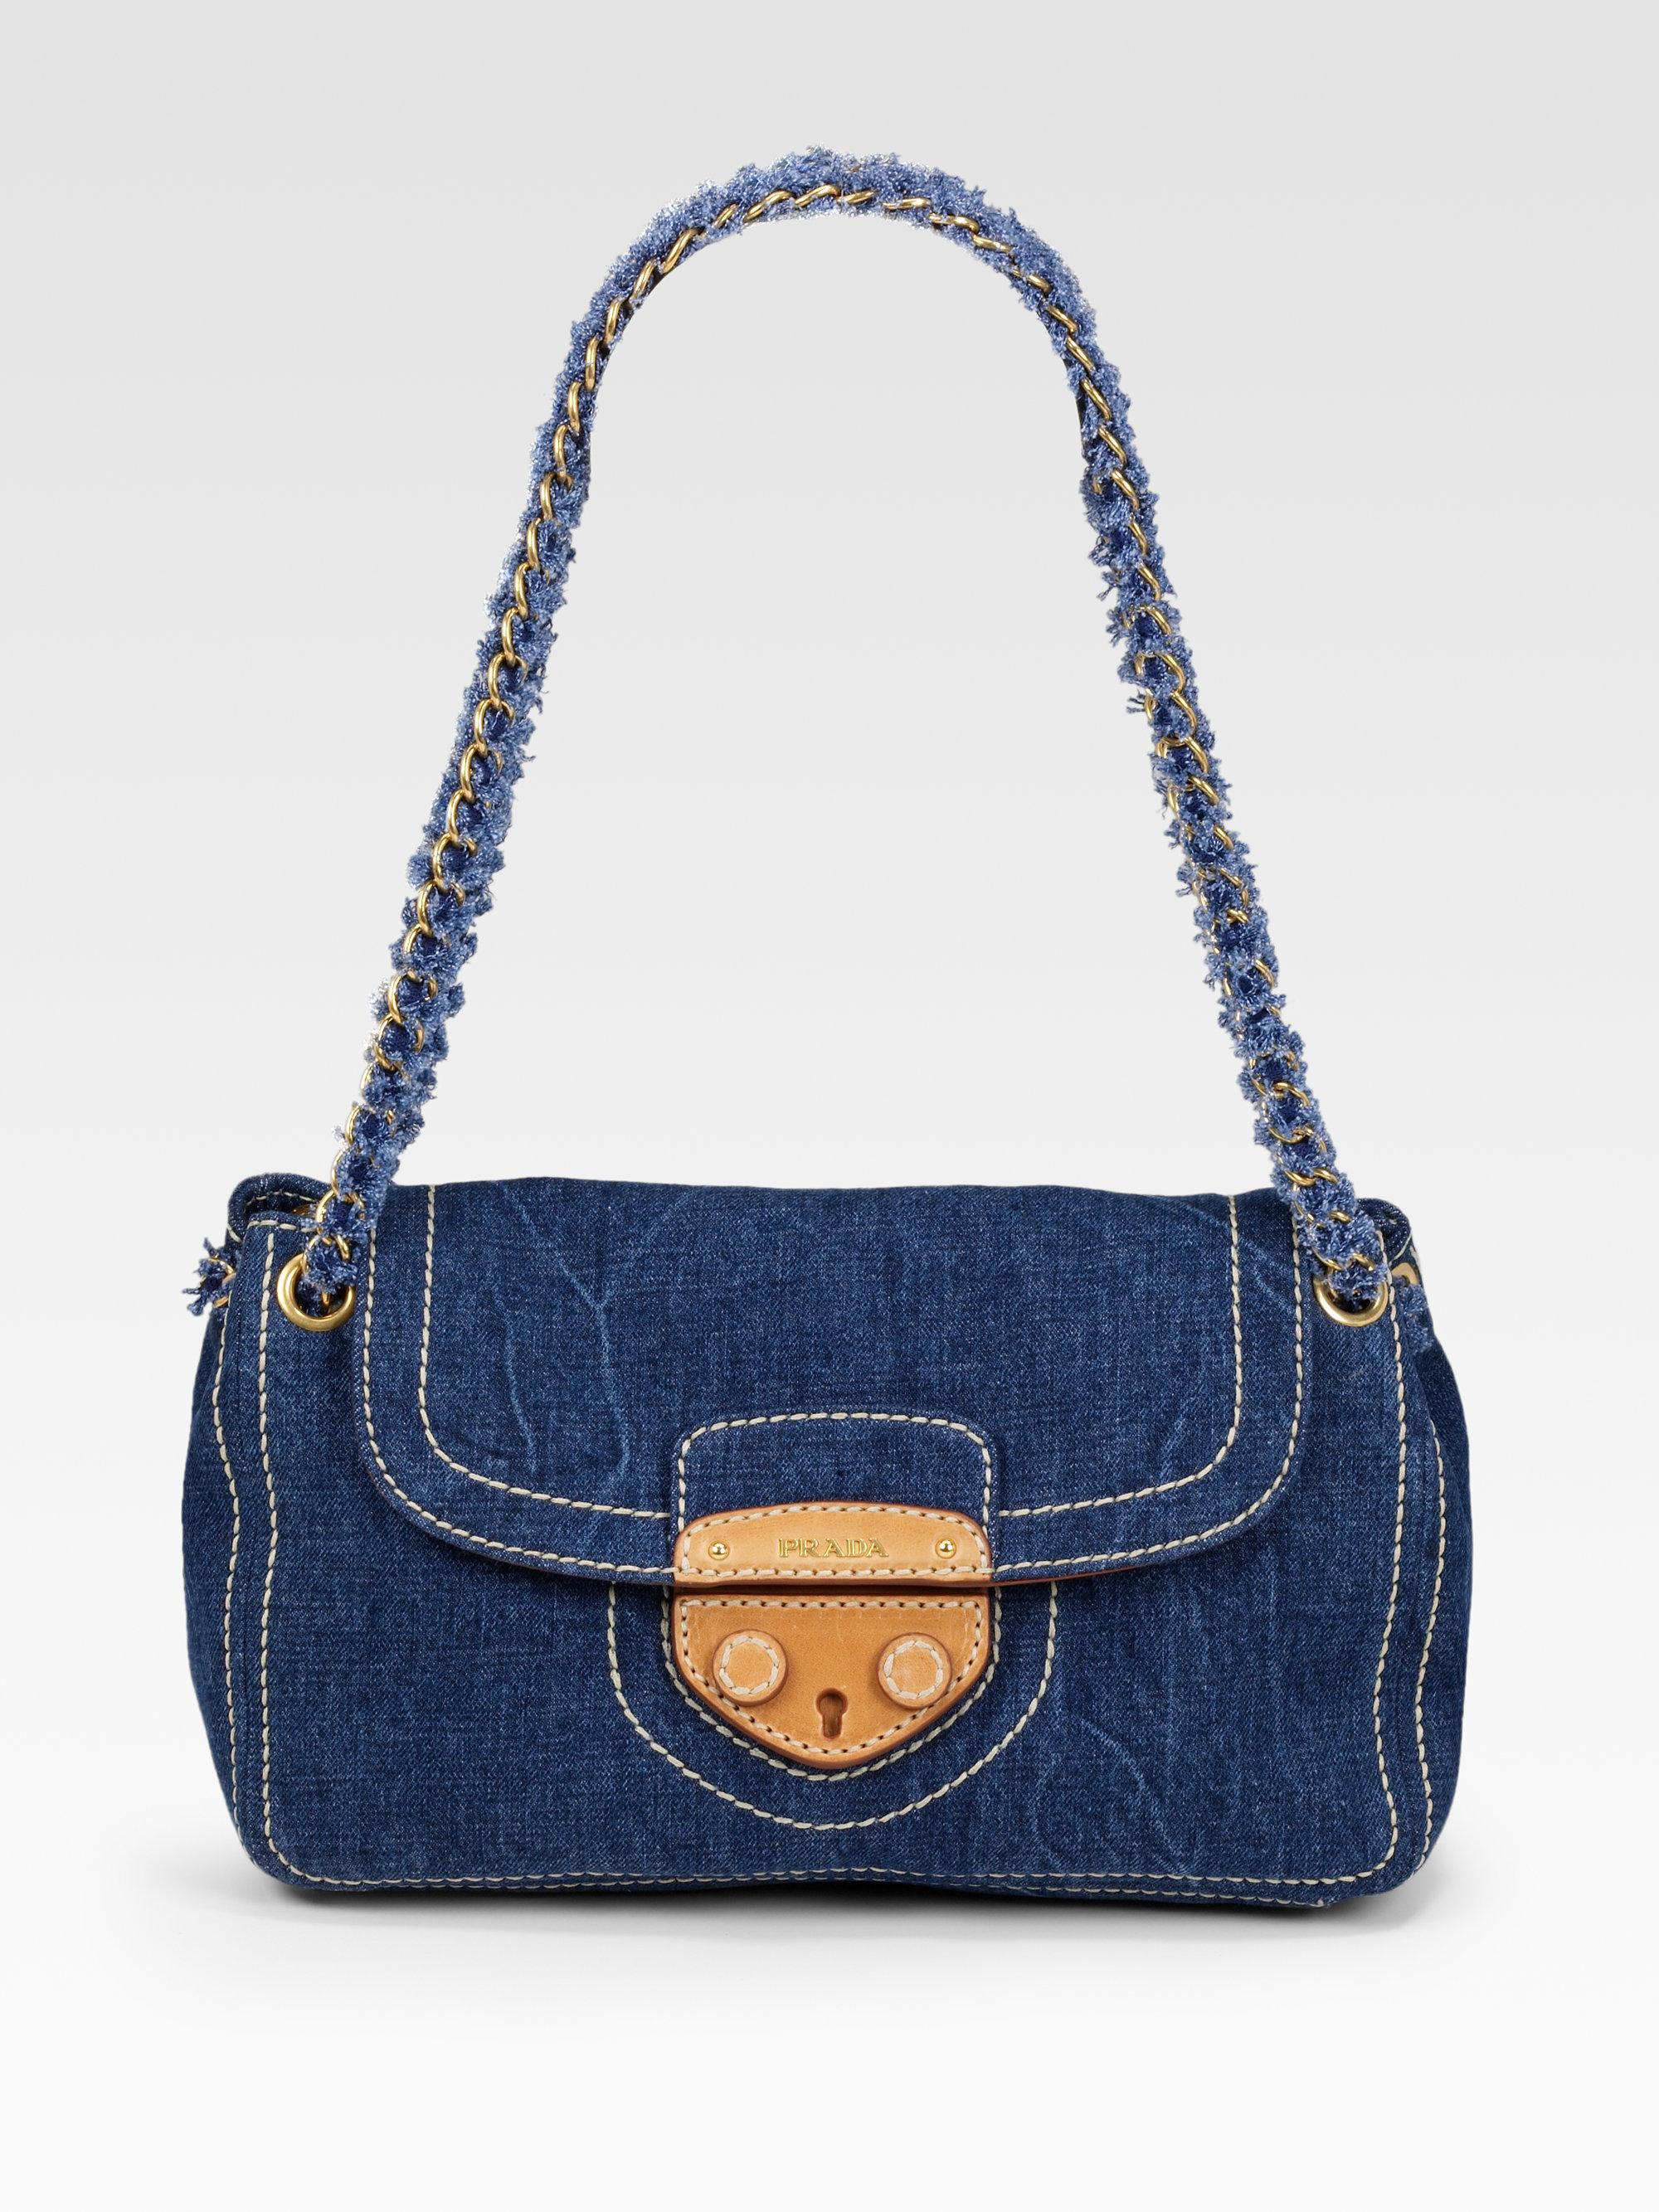 prada leather denim shoulder bag, prada clutches